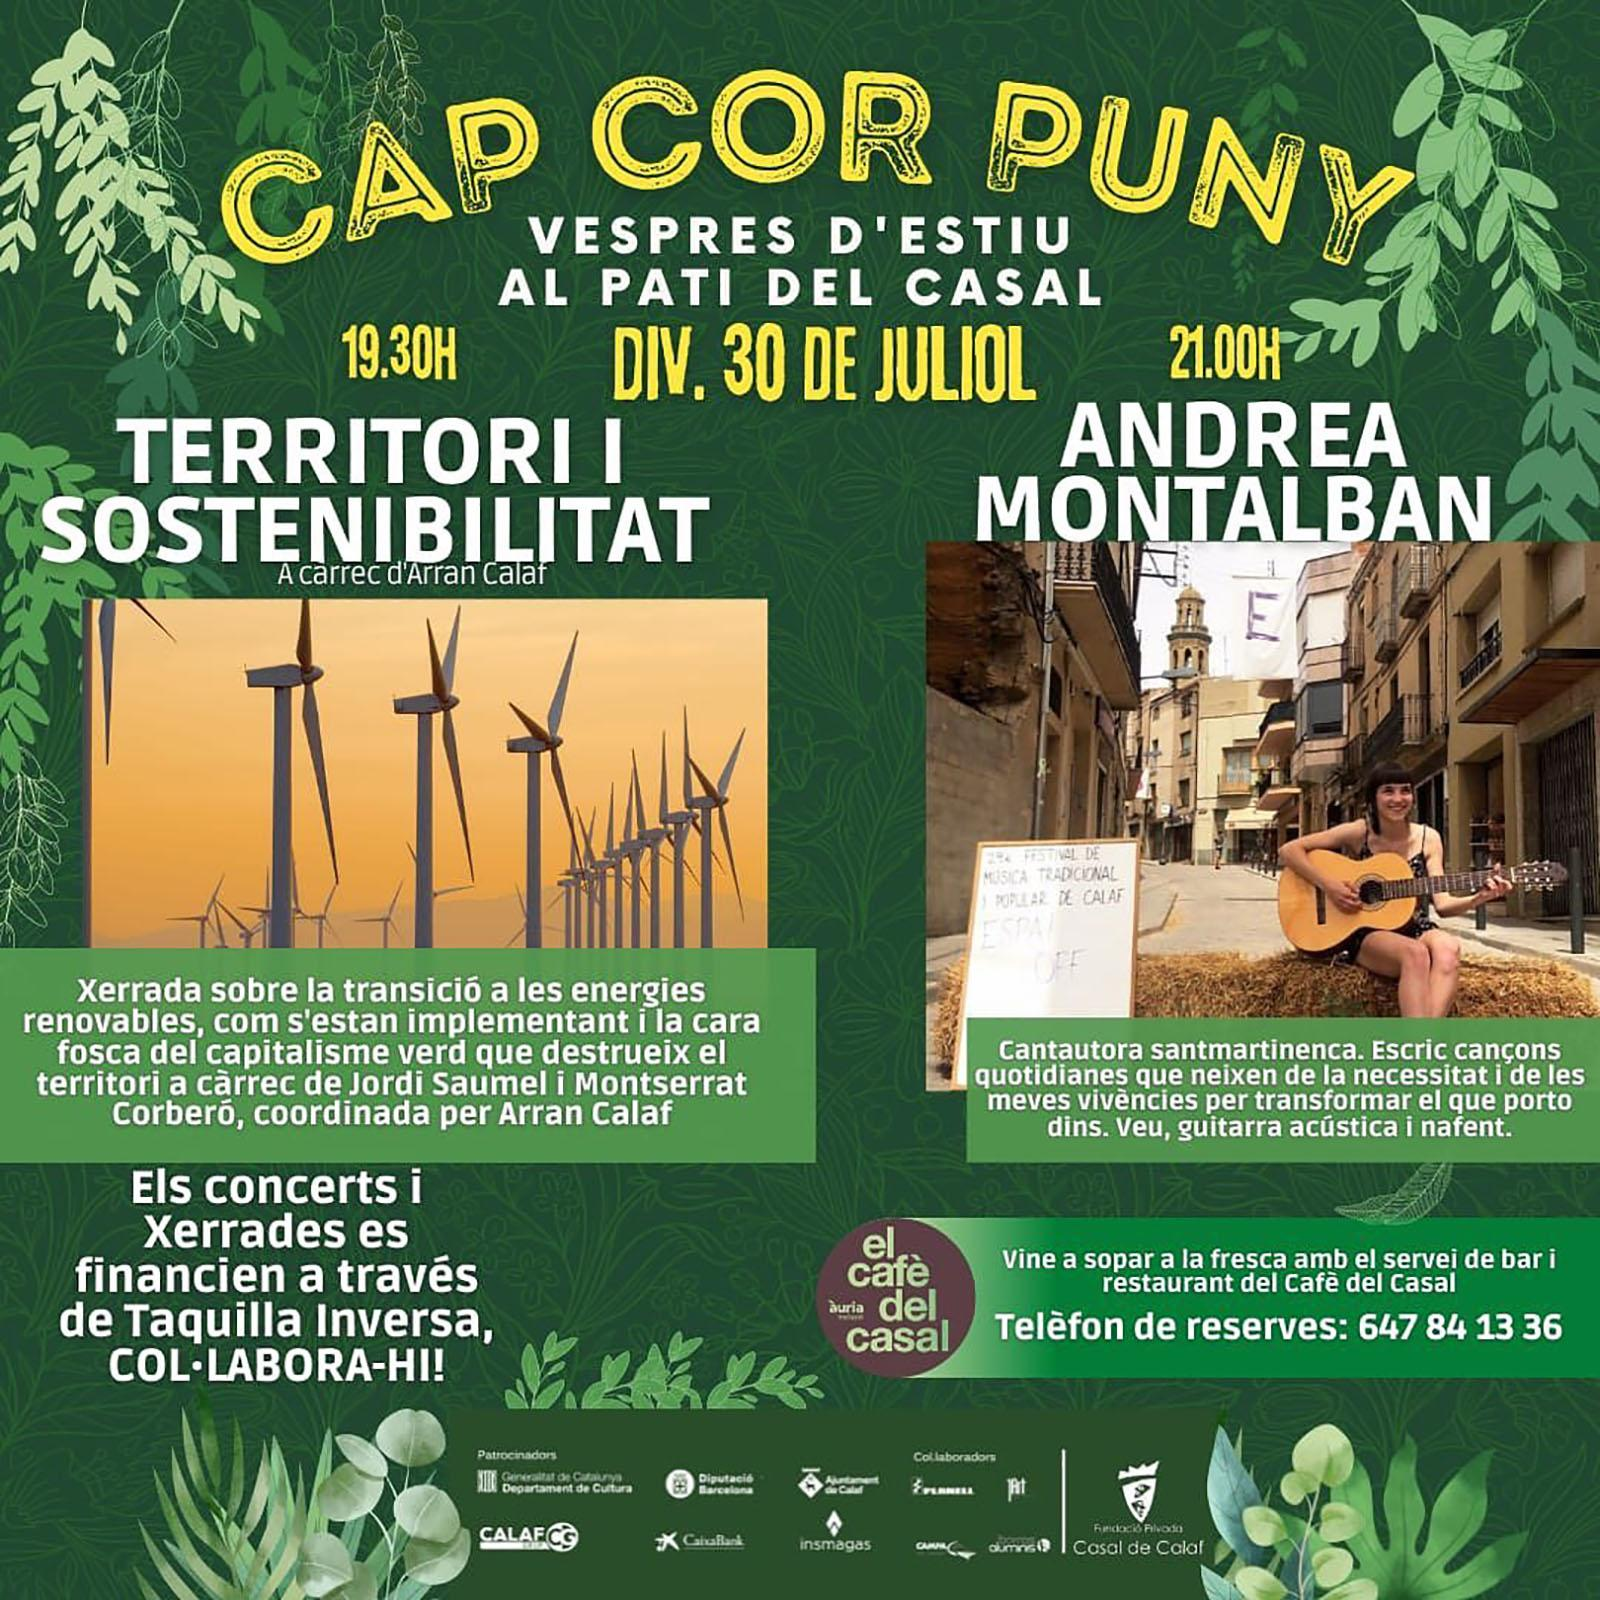 cartell Cap Cor Puny